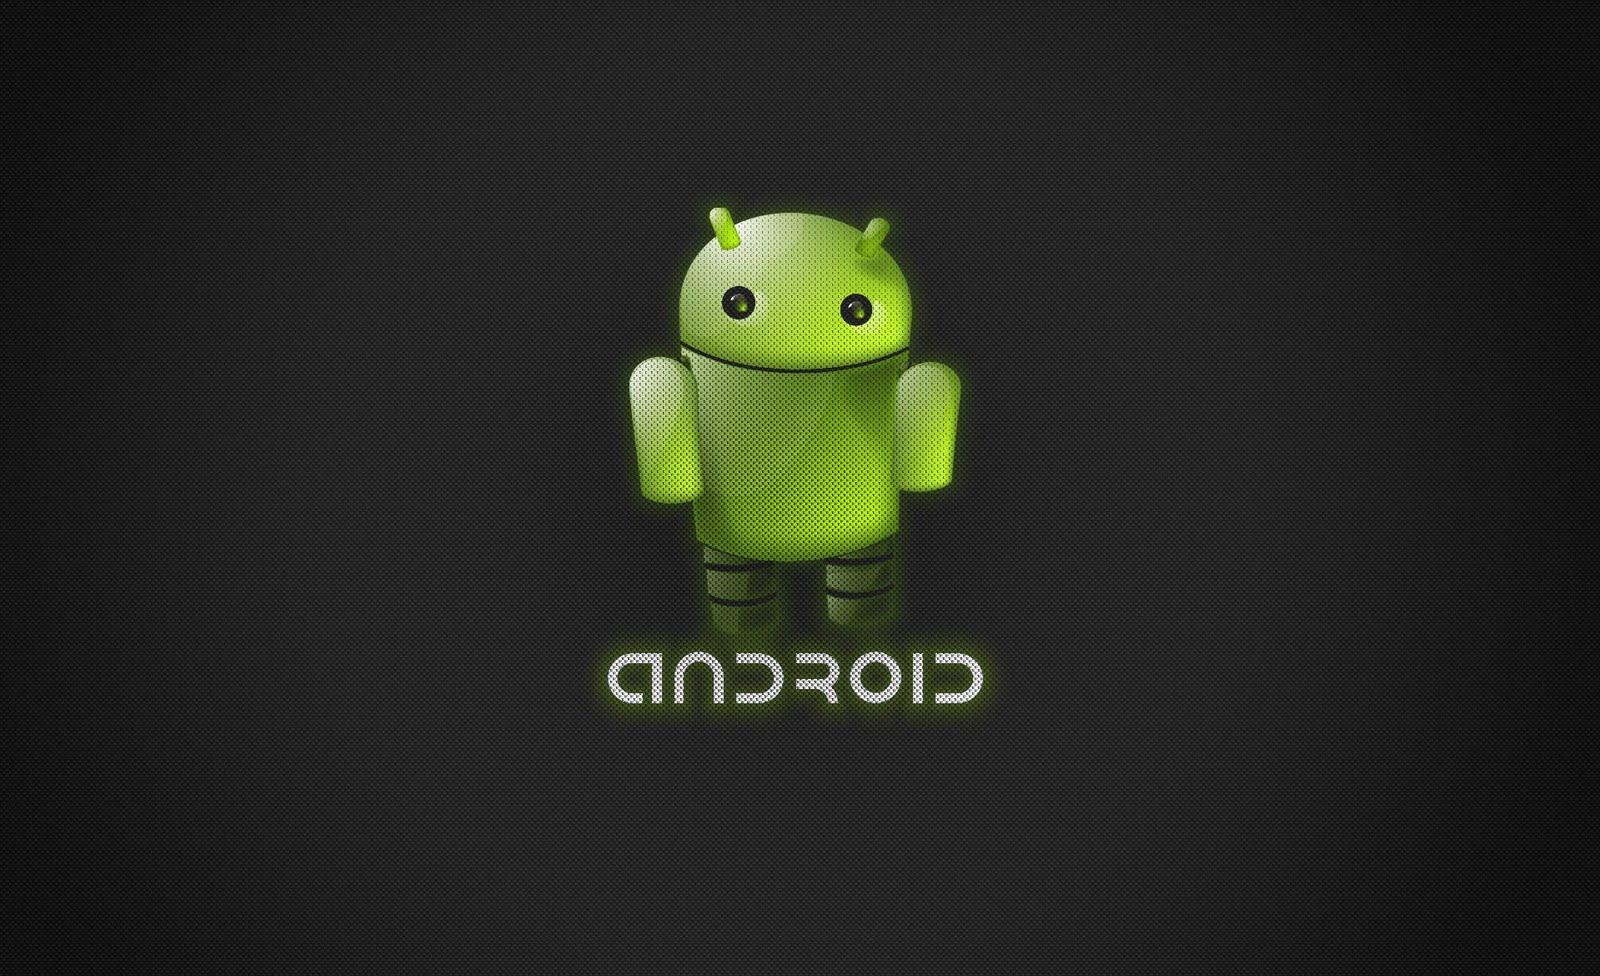 http://1.bp.blogspot.com/-z6Xflmb3lTM/TesqgK96LQI/AAAAAAAAADk/VKUojDZtD5Q/s1600/EgFox_Android_HD_2010_by_Eg_Art.jpg